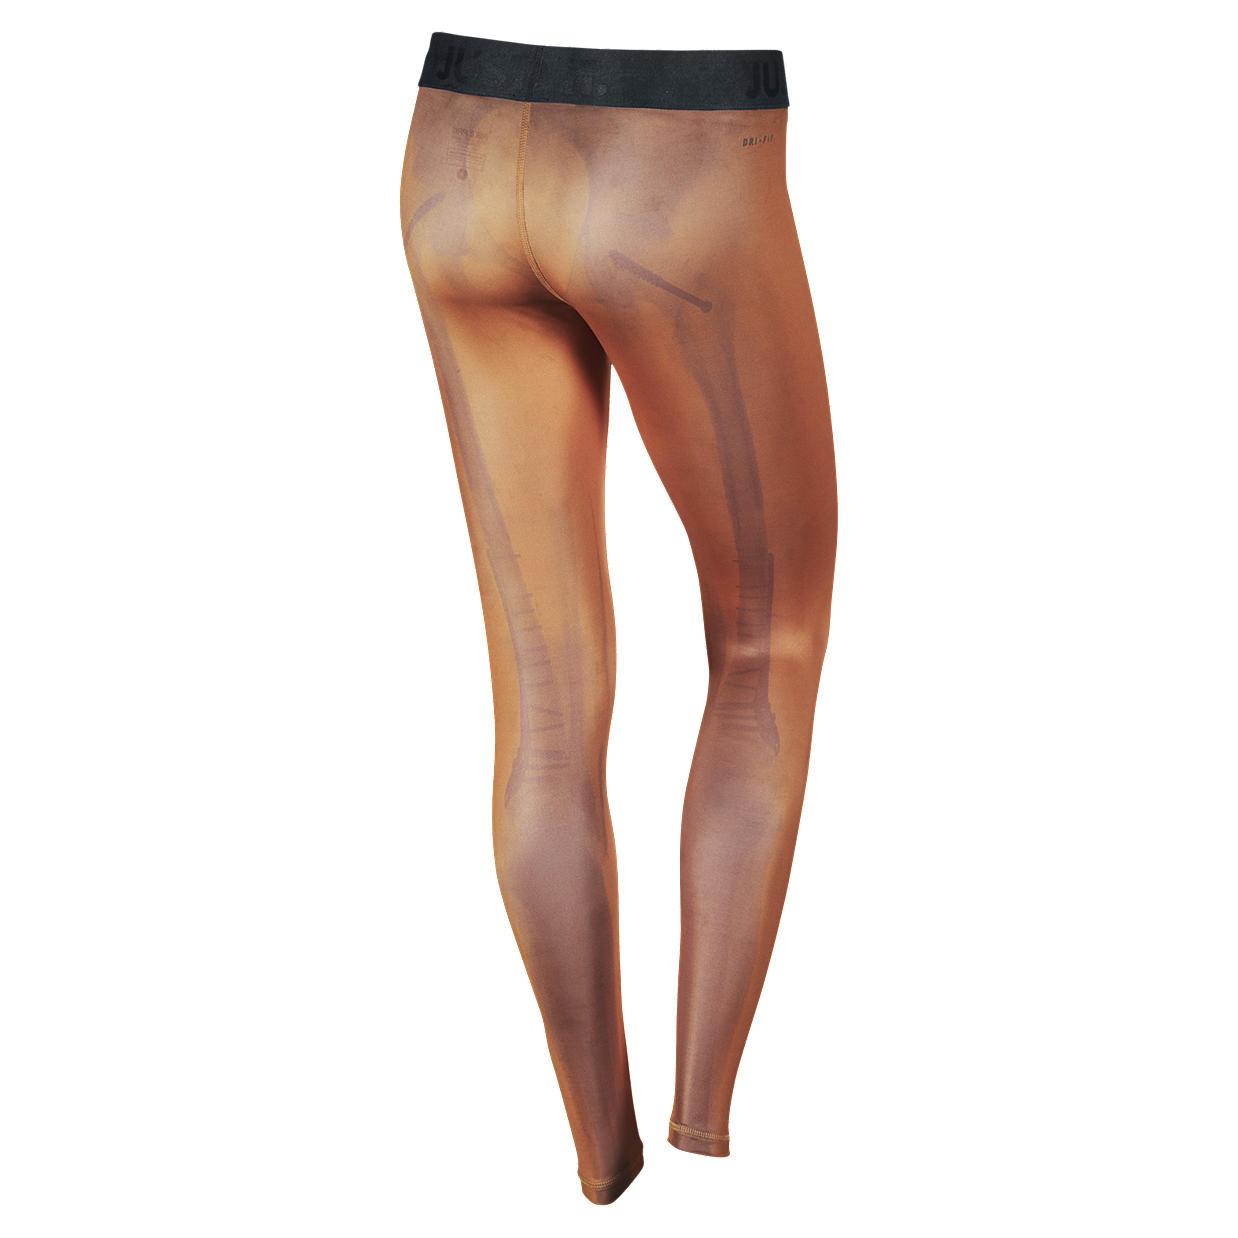 Nike-Pro-Printed-Womens-Tights-520779_235_B.png&wid=1238&hei=1238&fmt=jpg.jpg